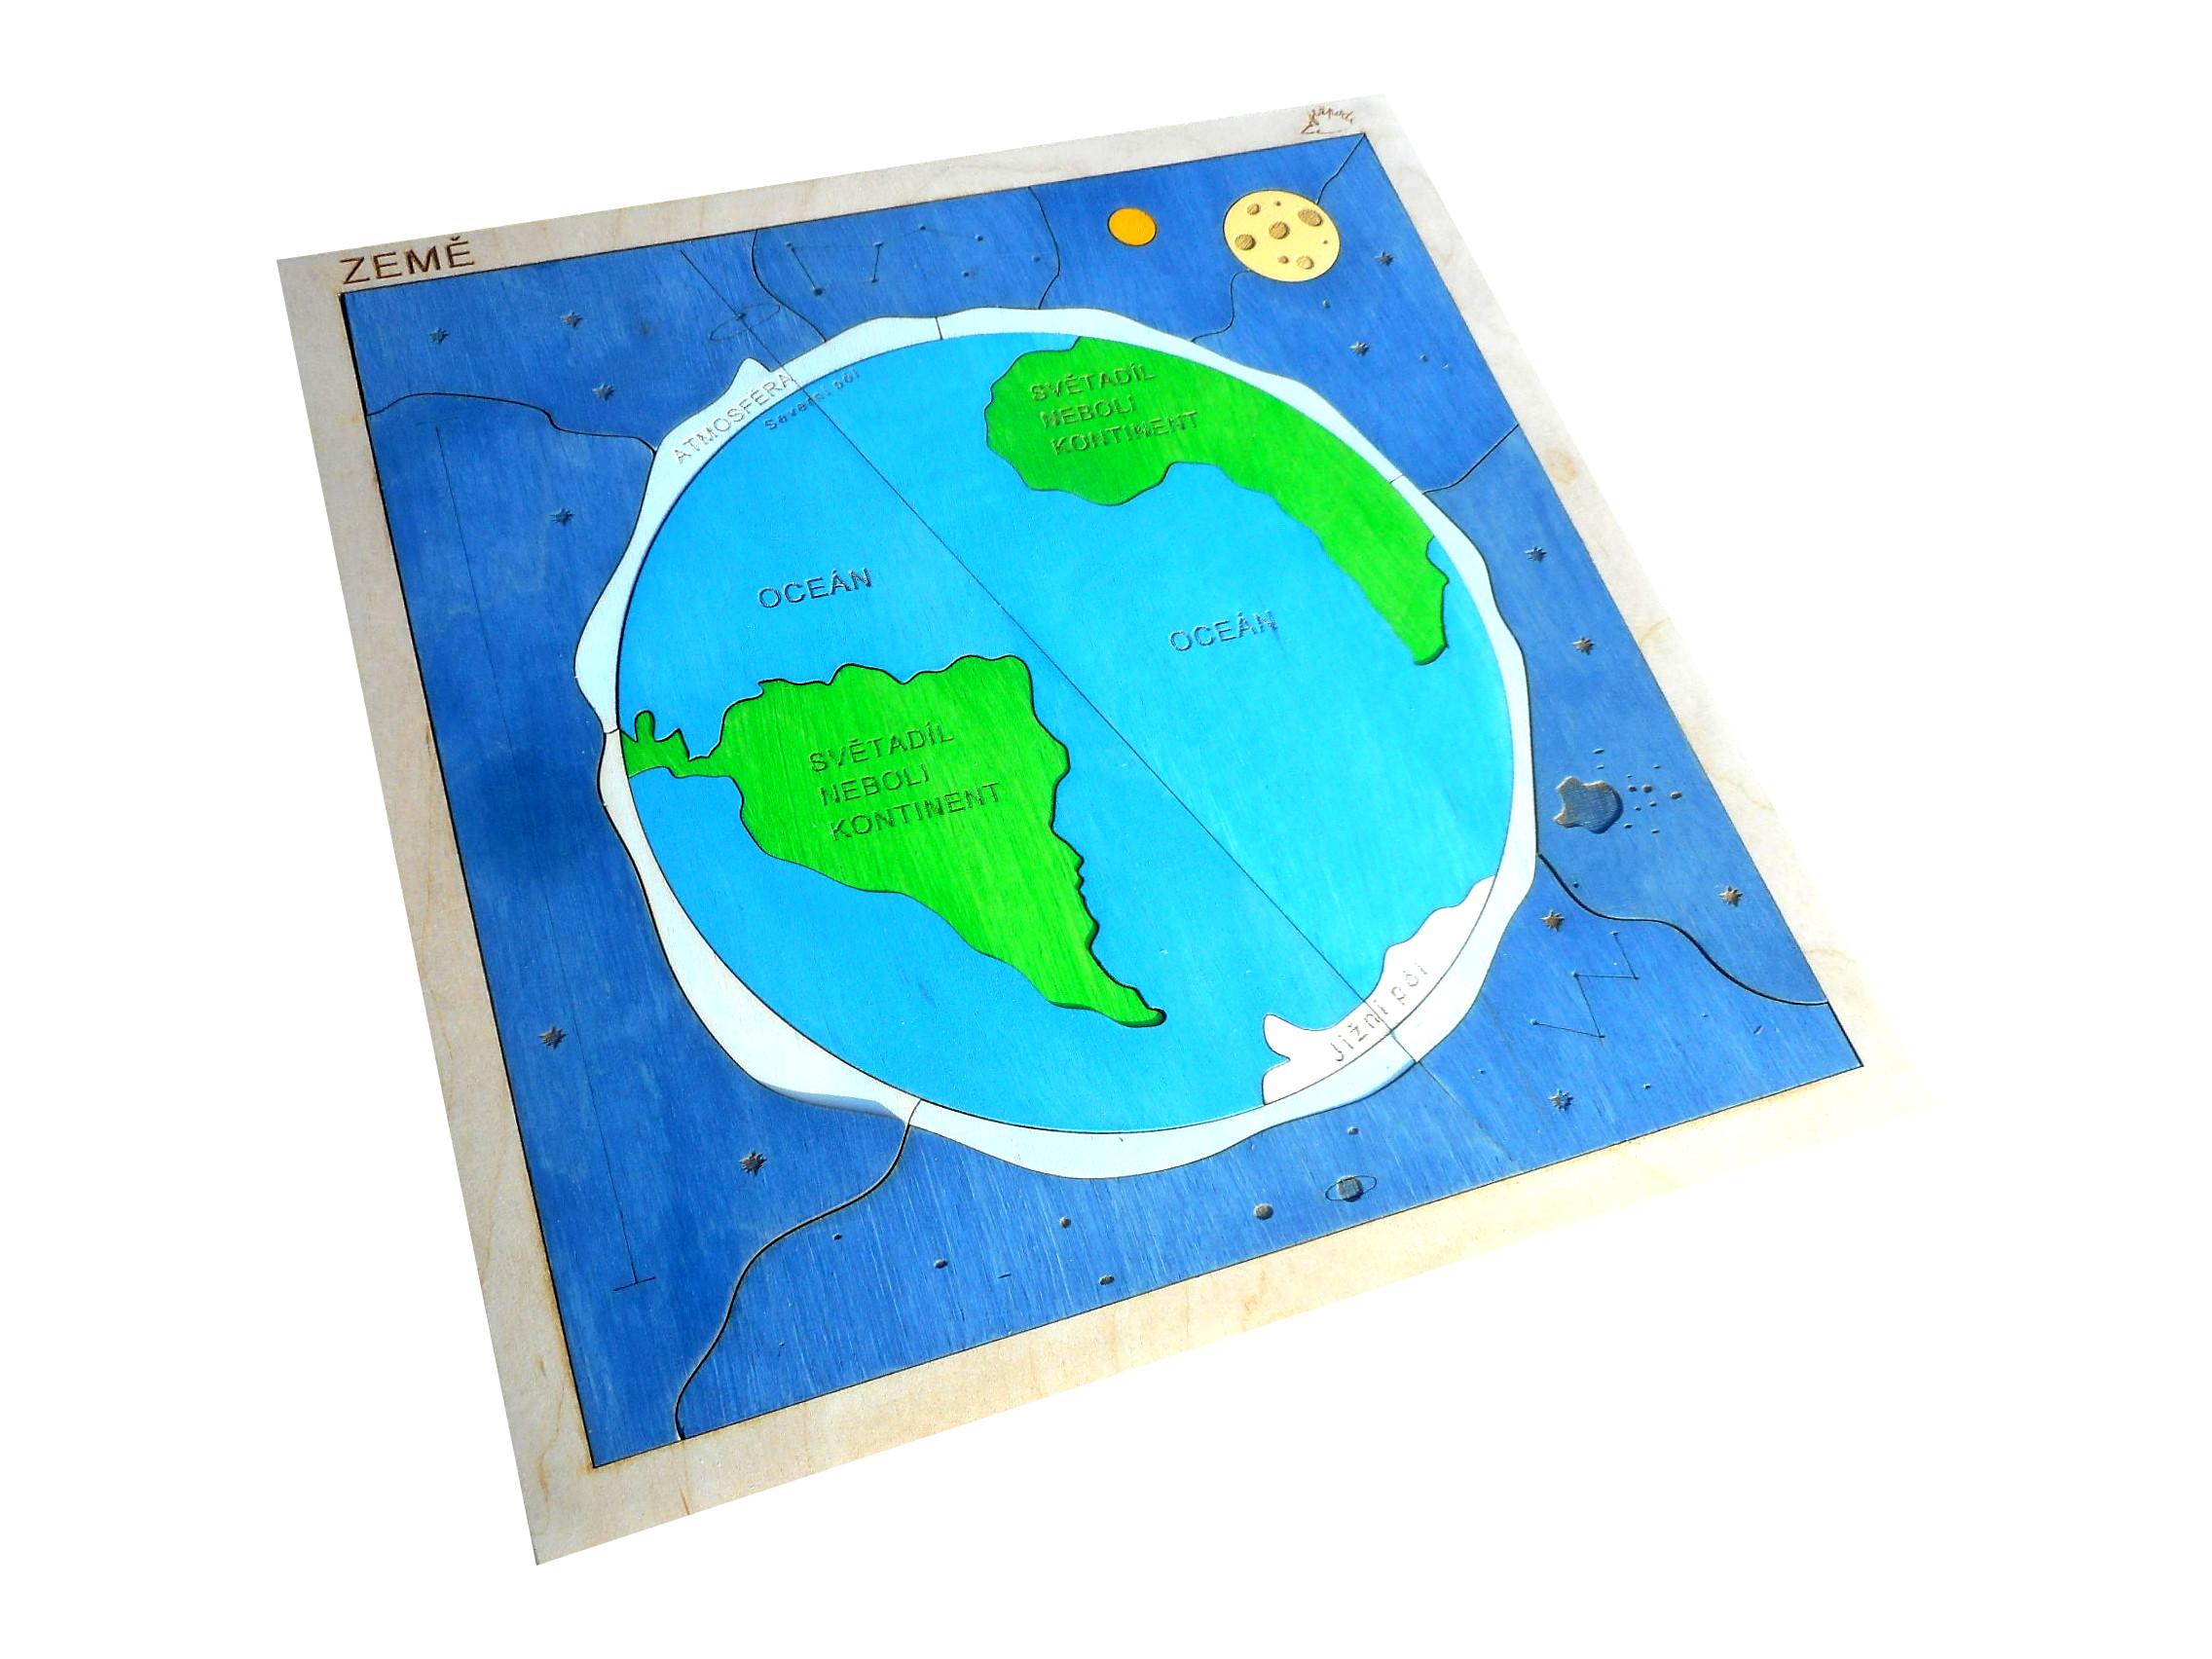 Země - naše planeta